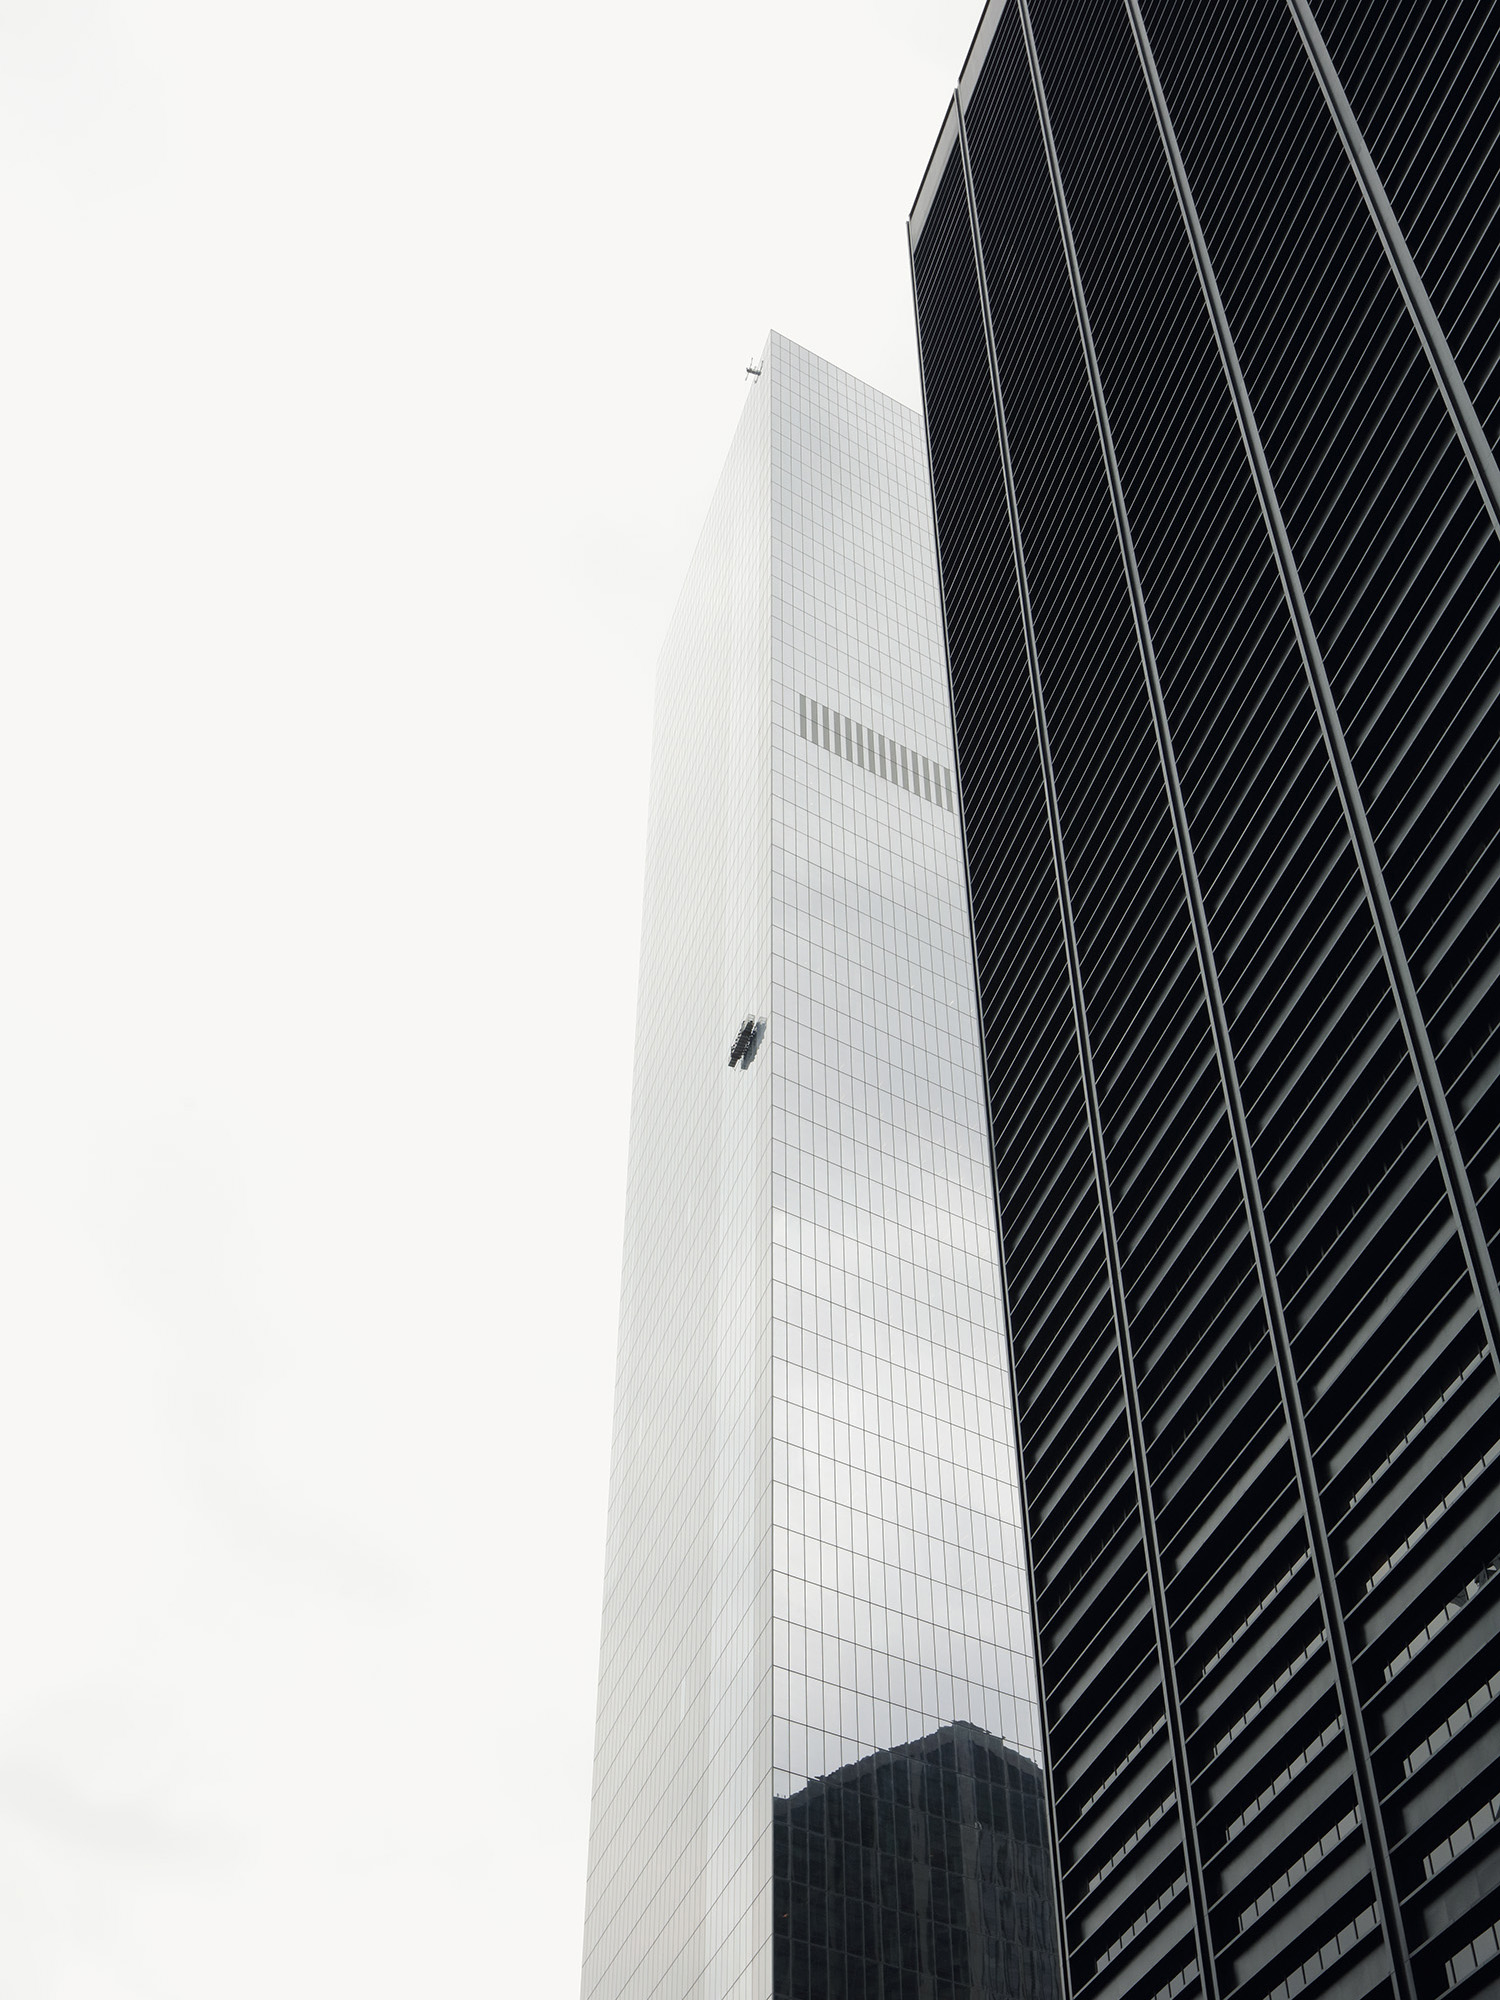 Financial district _ New York